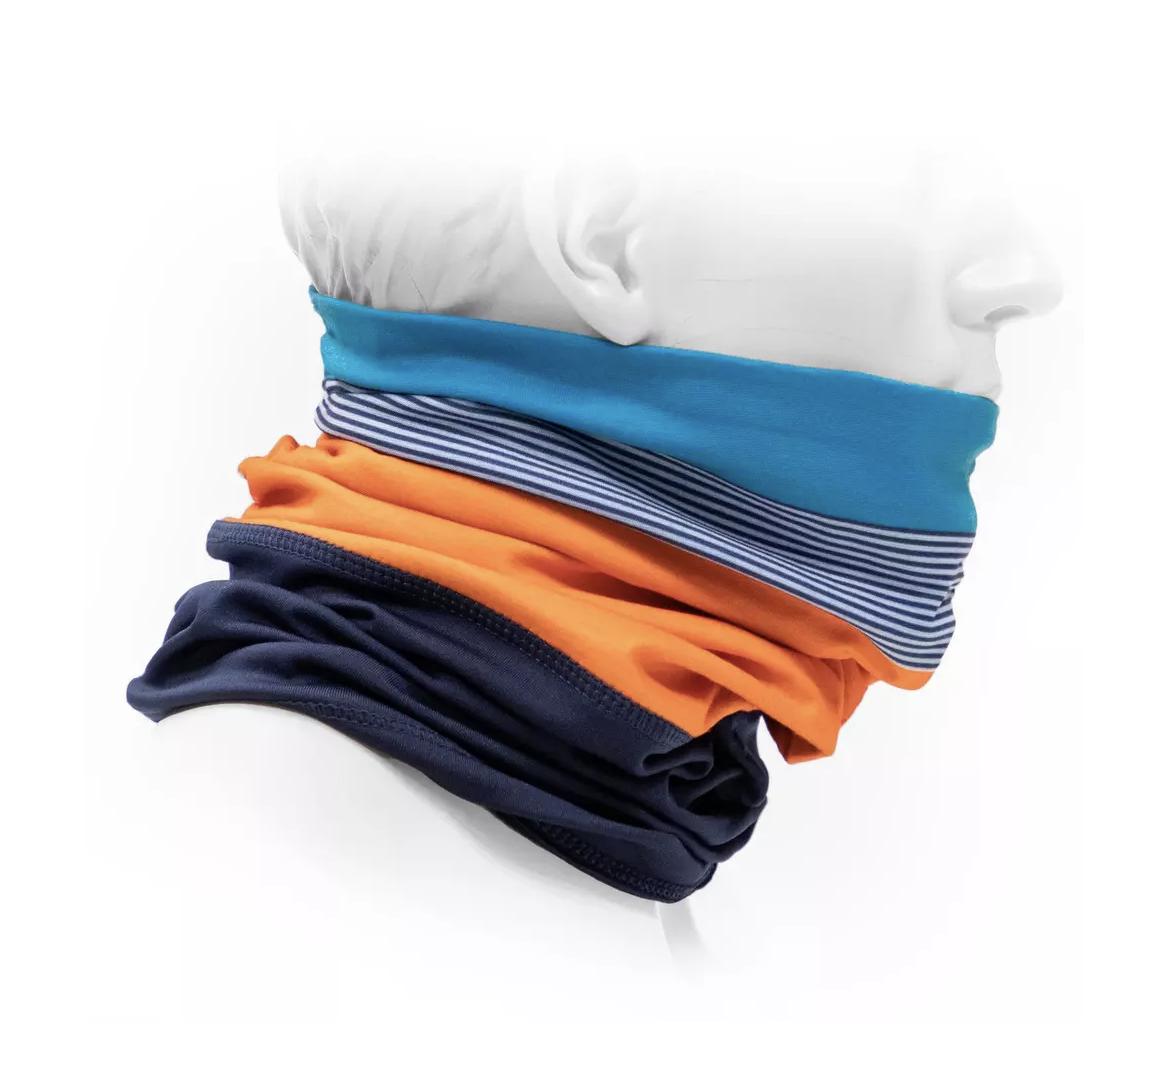 DECATHLON 迪卡侬 500系列 户外围巾 159171-8549181 黑色/黑色